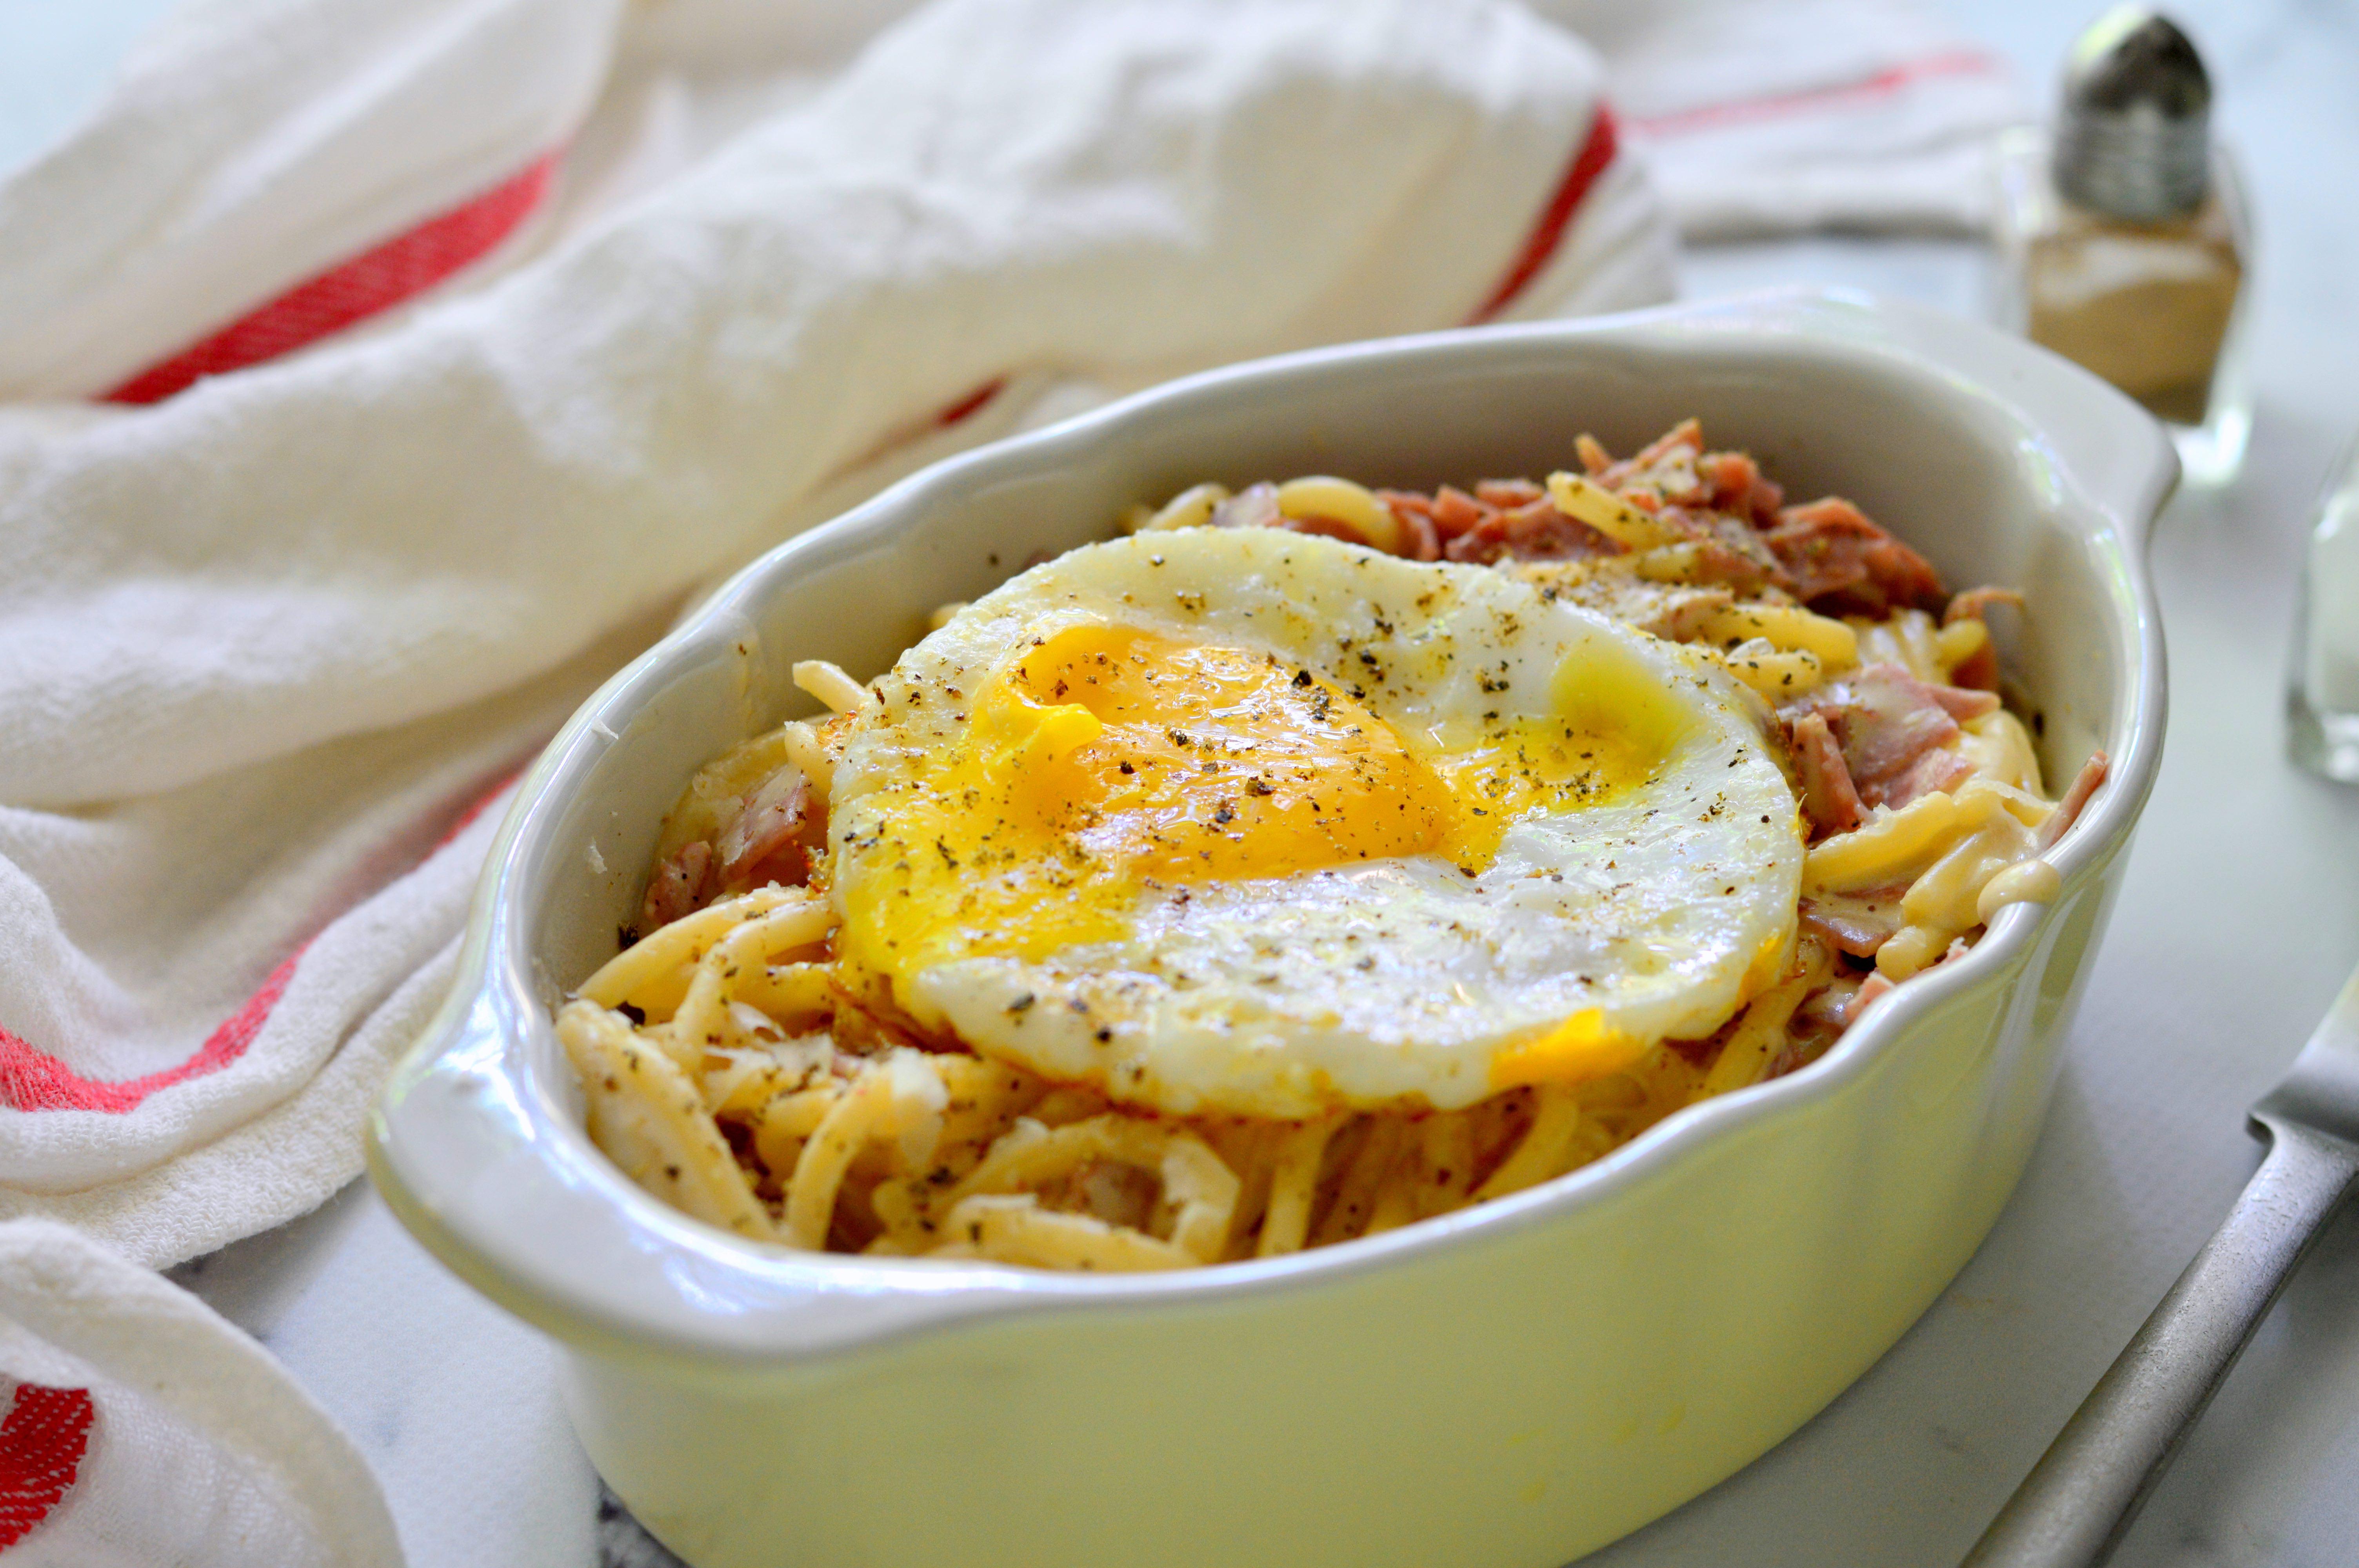 2019_06_ham_and_eggs_spagetti2_kicsi.jpg